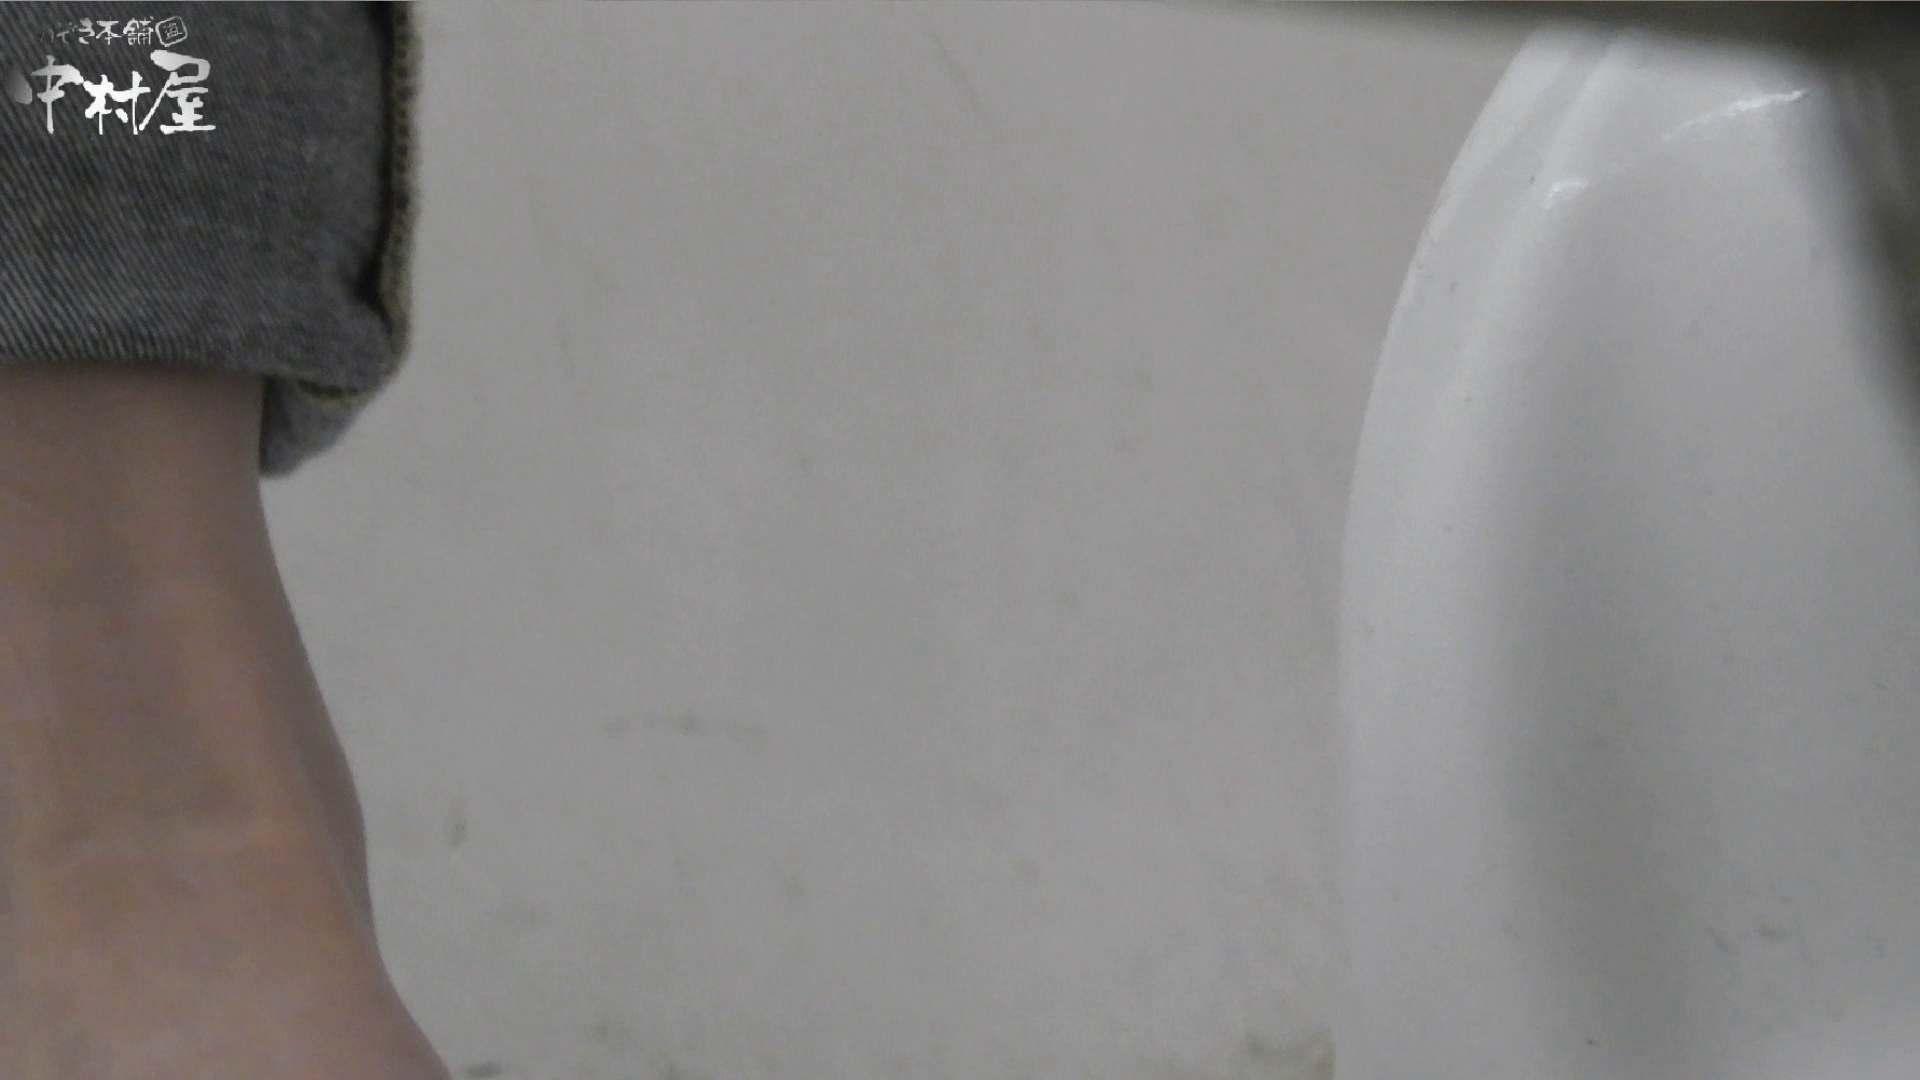 vol.42 命がけ潜伏洗面所! カカト上げながら・硬度強(太)・180g 潜入 | プライベート  101PIX 88